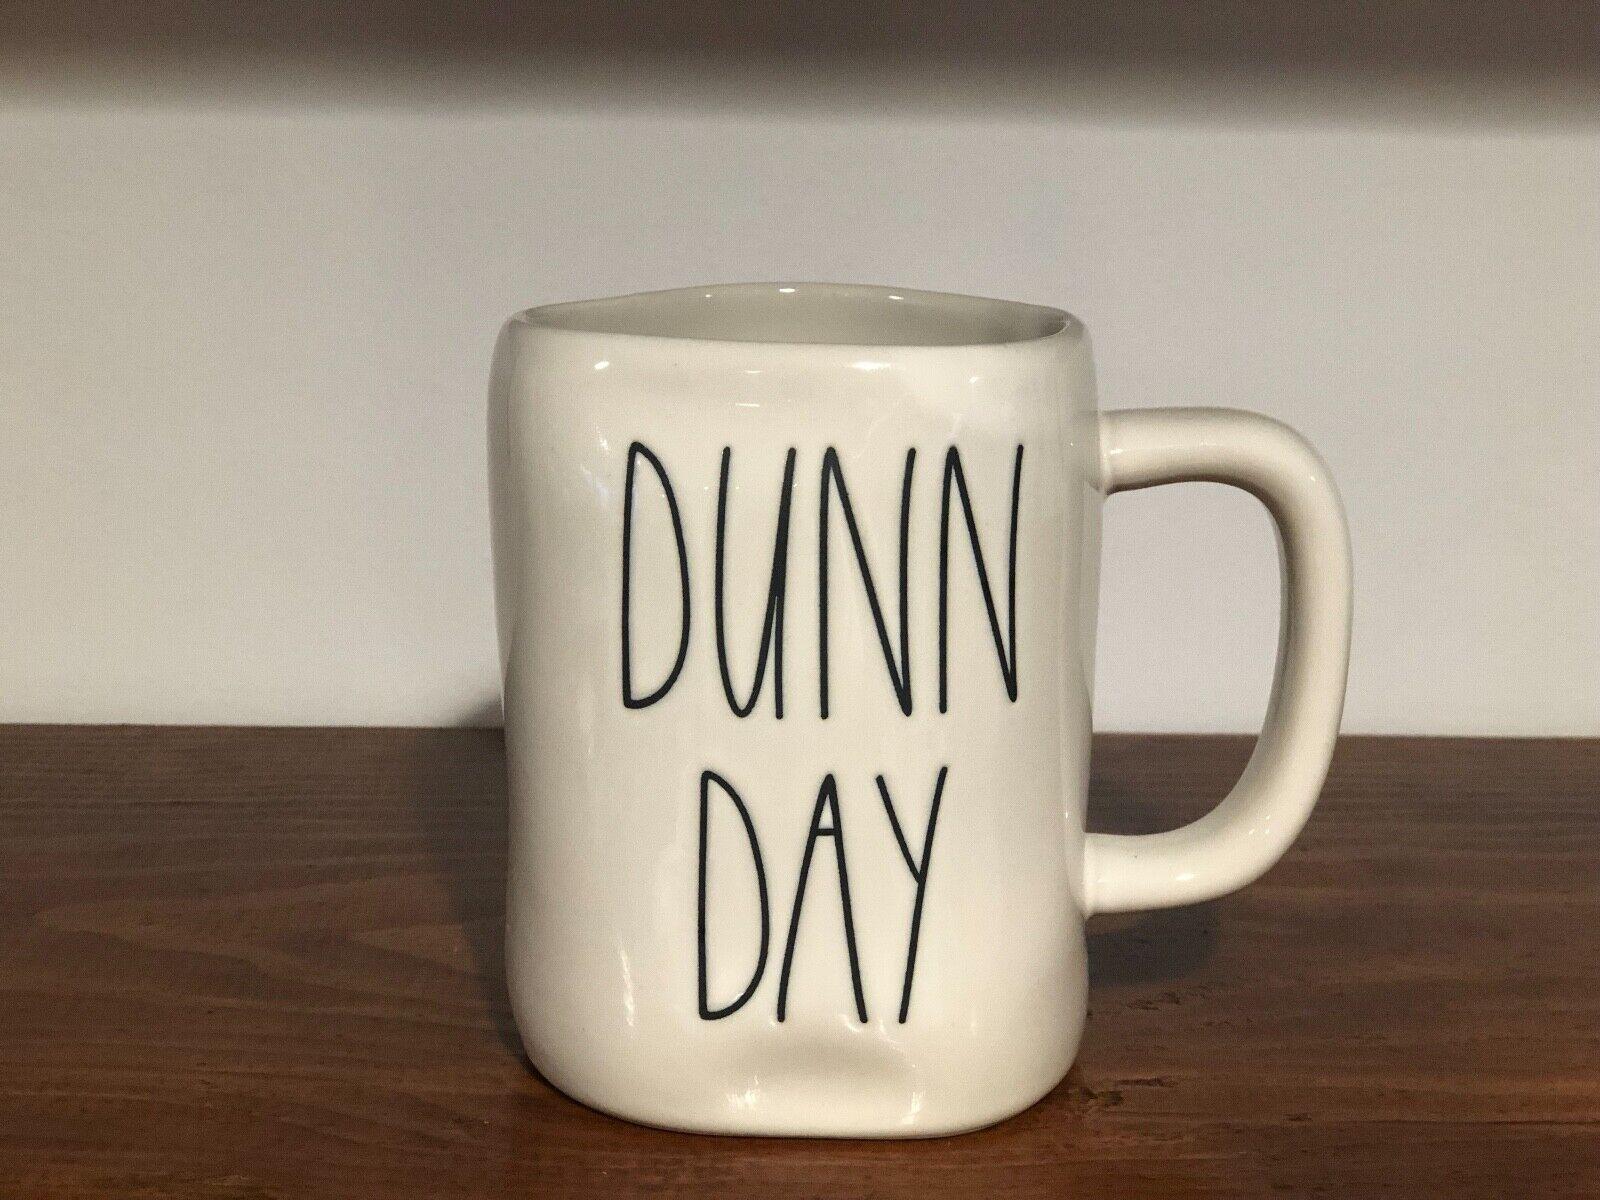 Rae Dunn Artisan Collection By Magenta Farmhouse LL Large Letter Coffee Tea Mug DUNN DAY